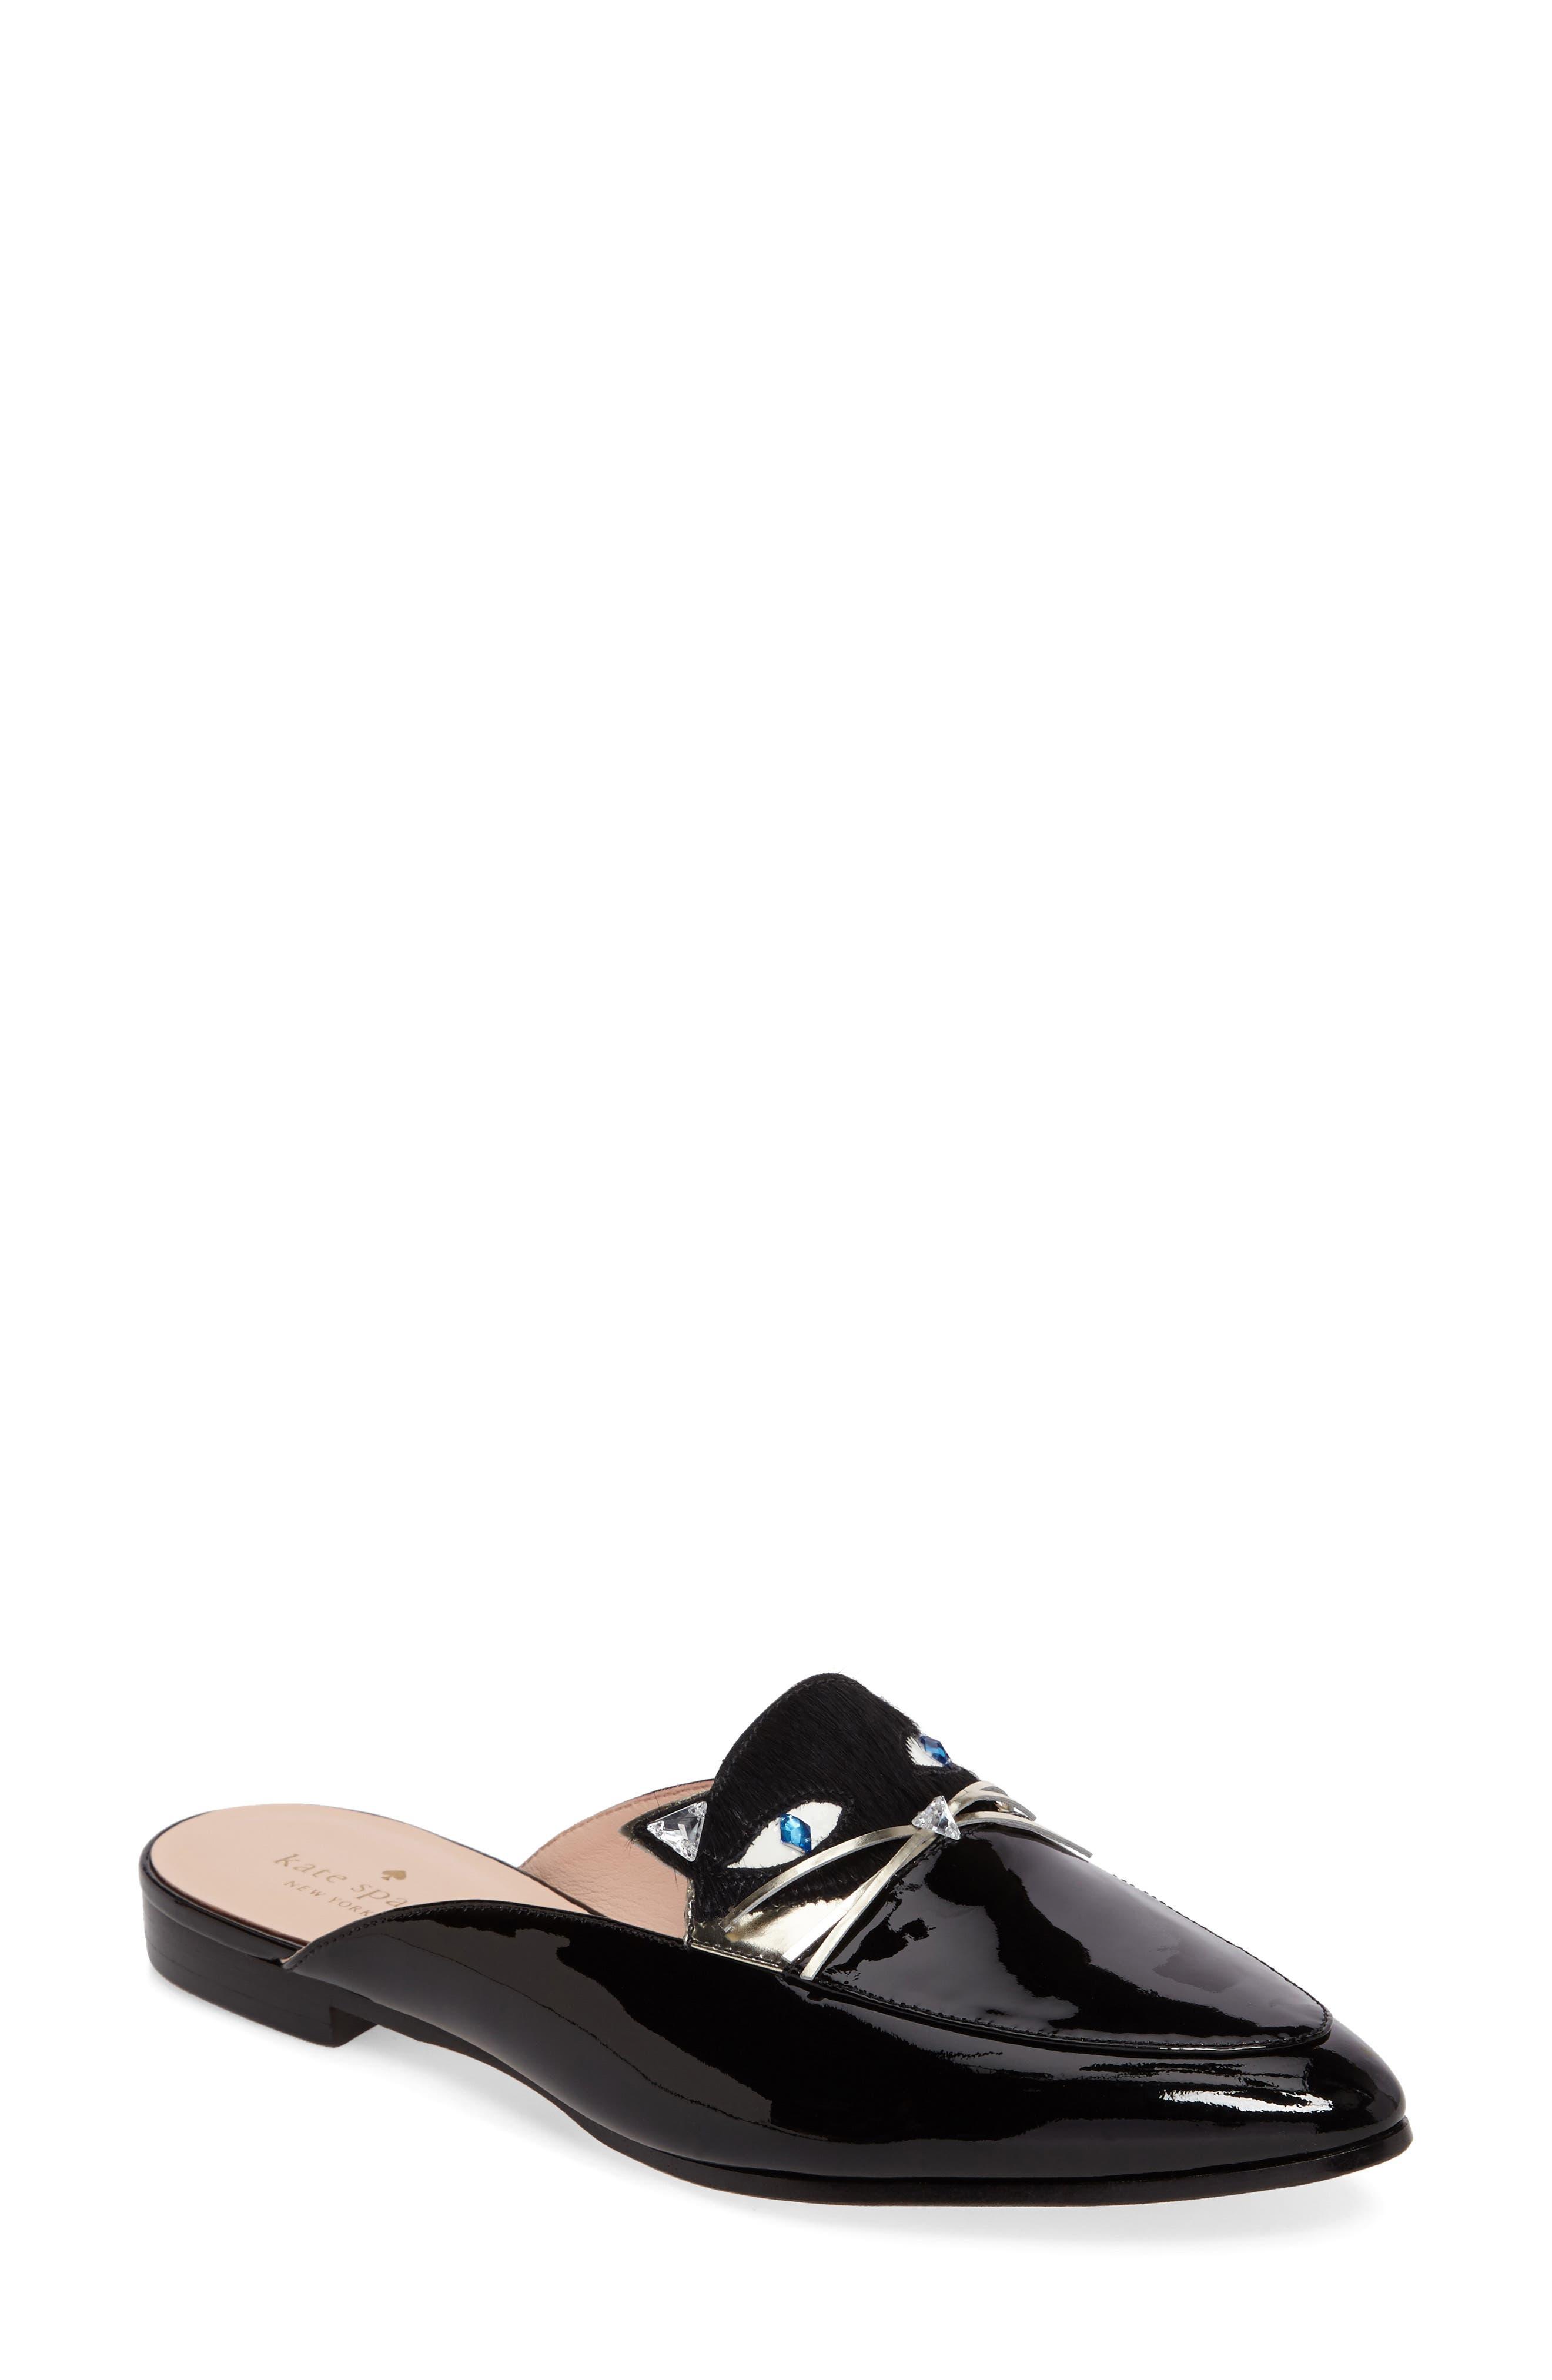 casper mule loafer,                         Main,                         color, Black Patent